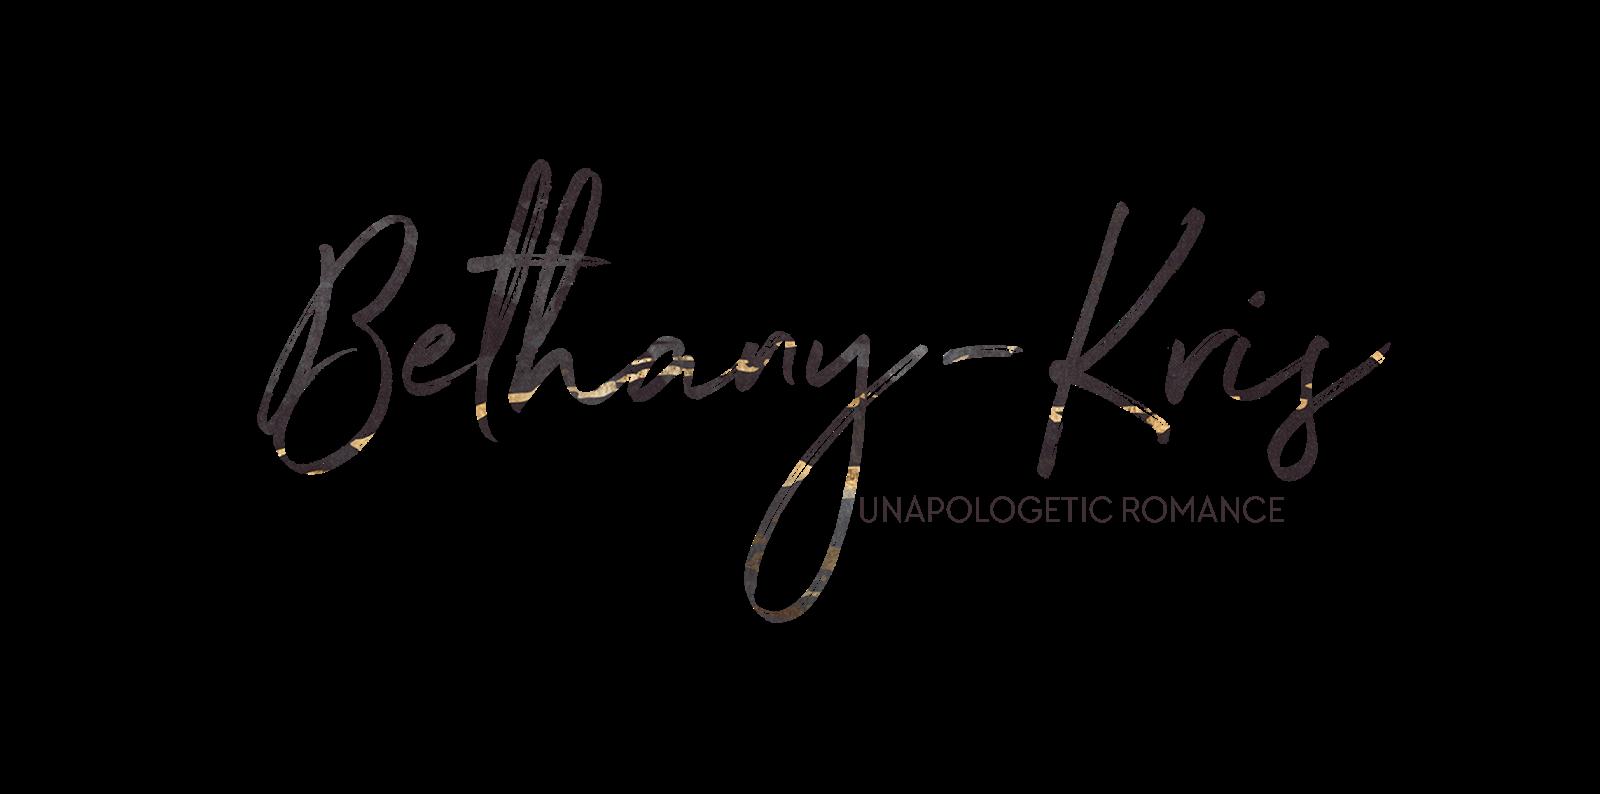 Bethany-Kris